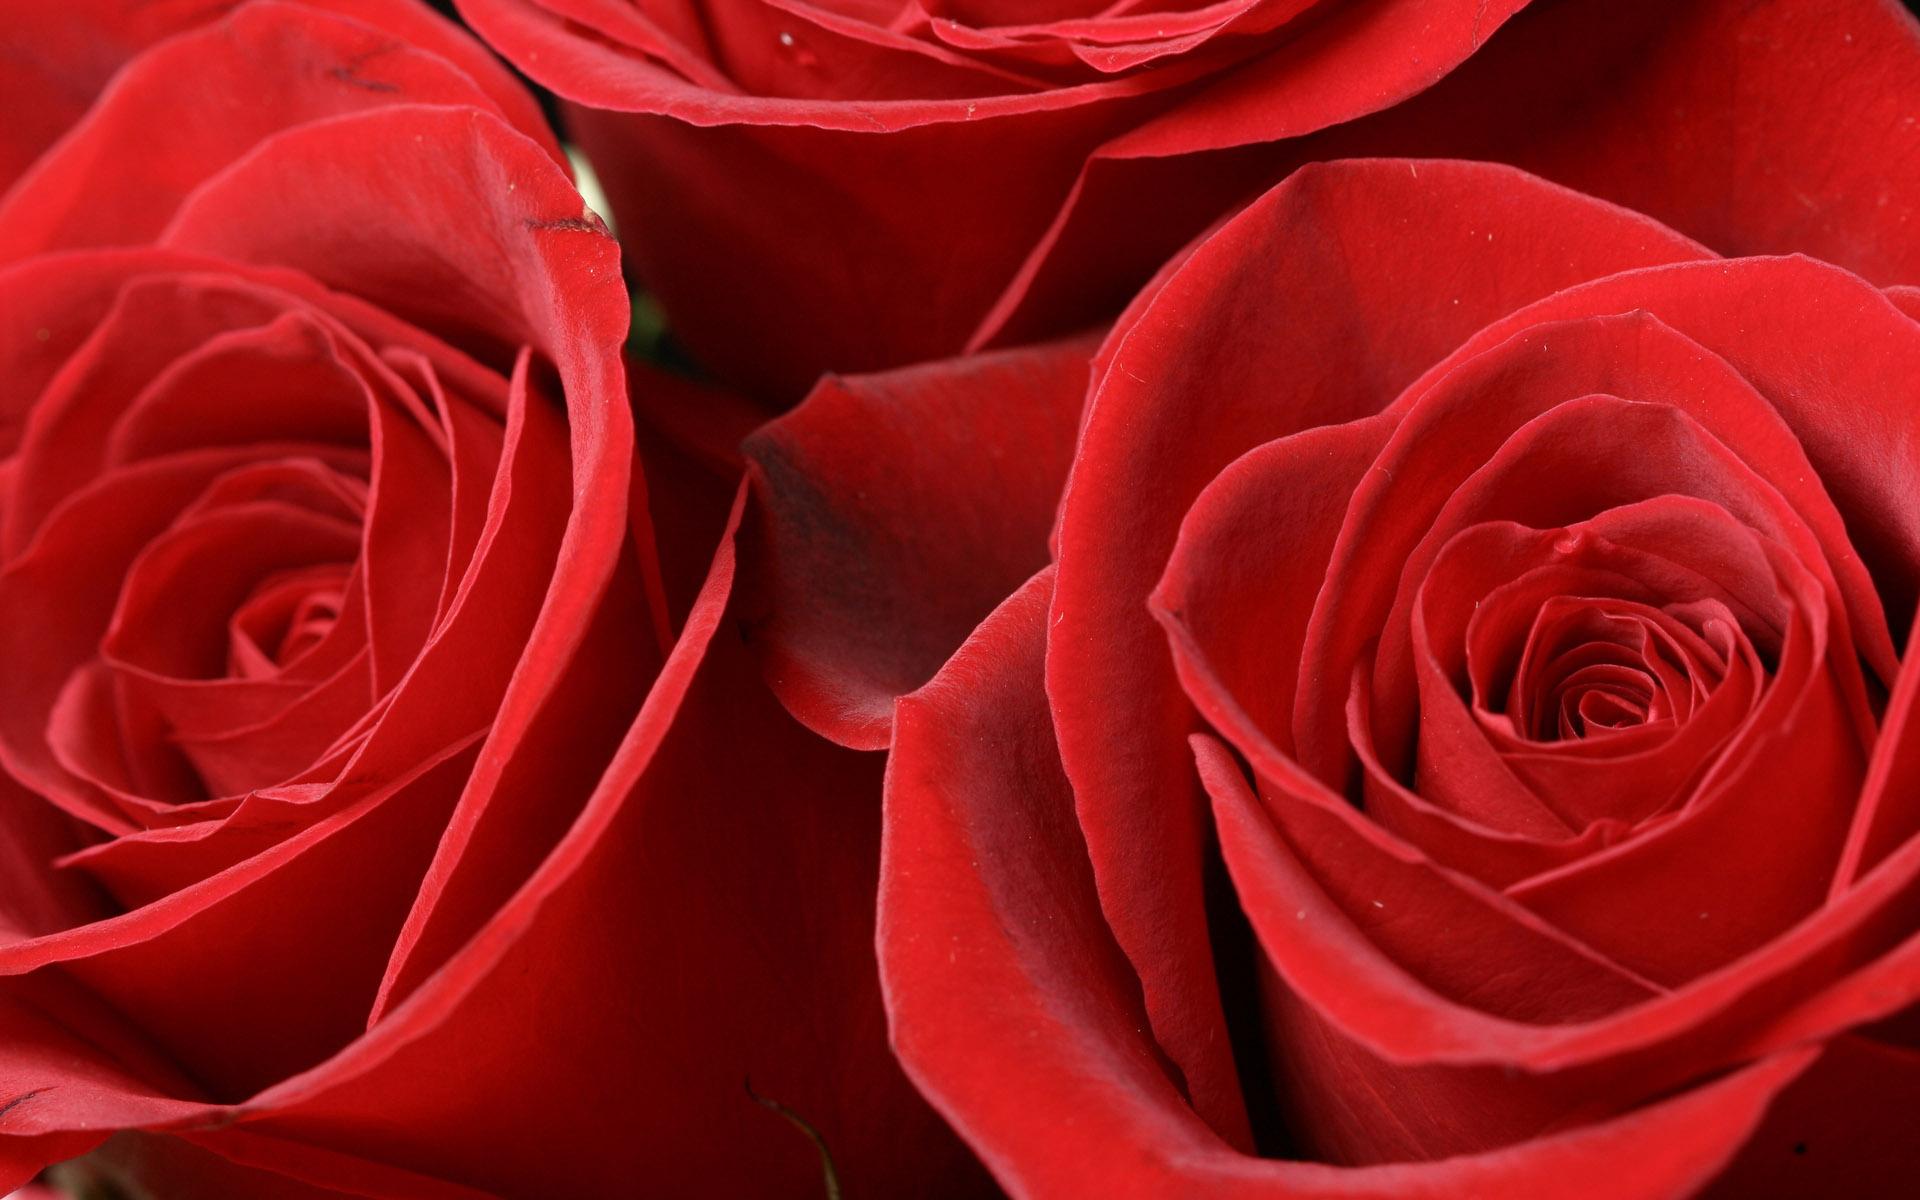 Rose Spagnuolo Obituary - Macomb Township, Michigan - Wujek ...